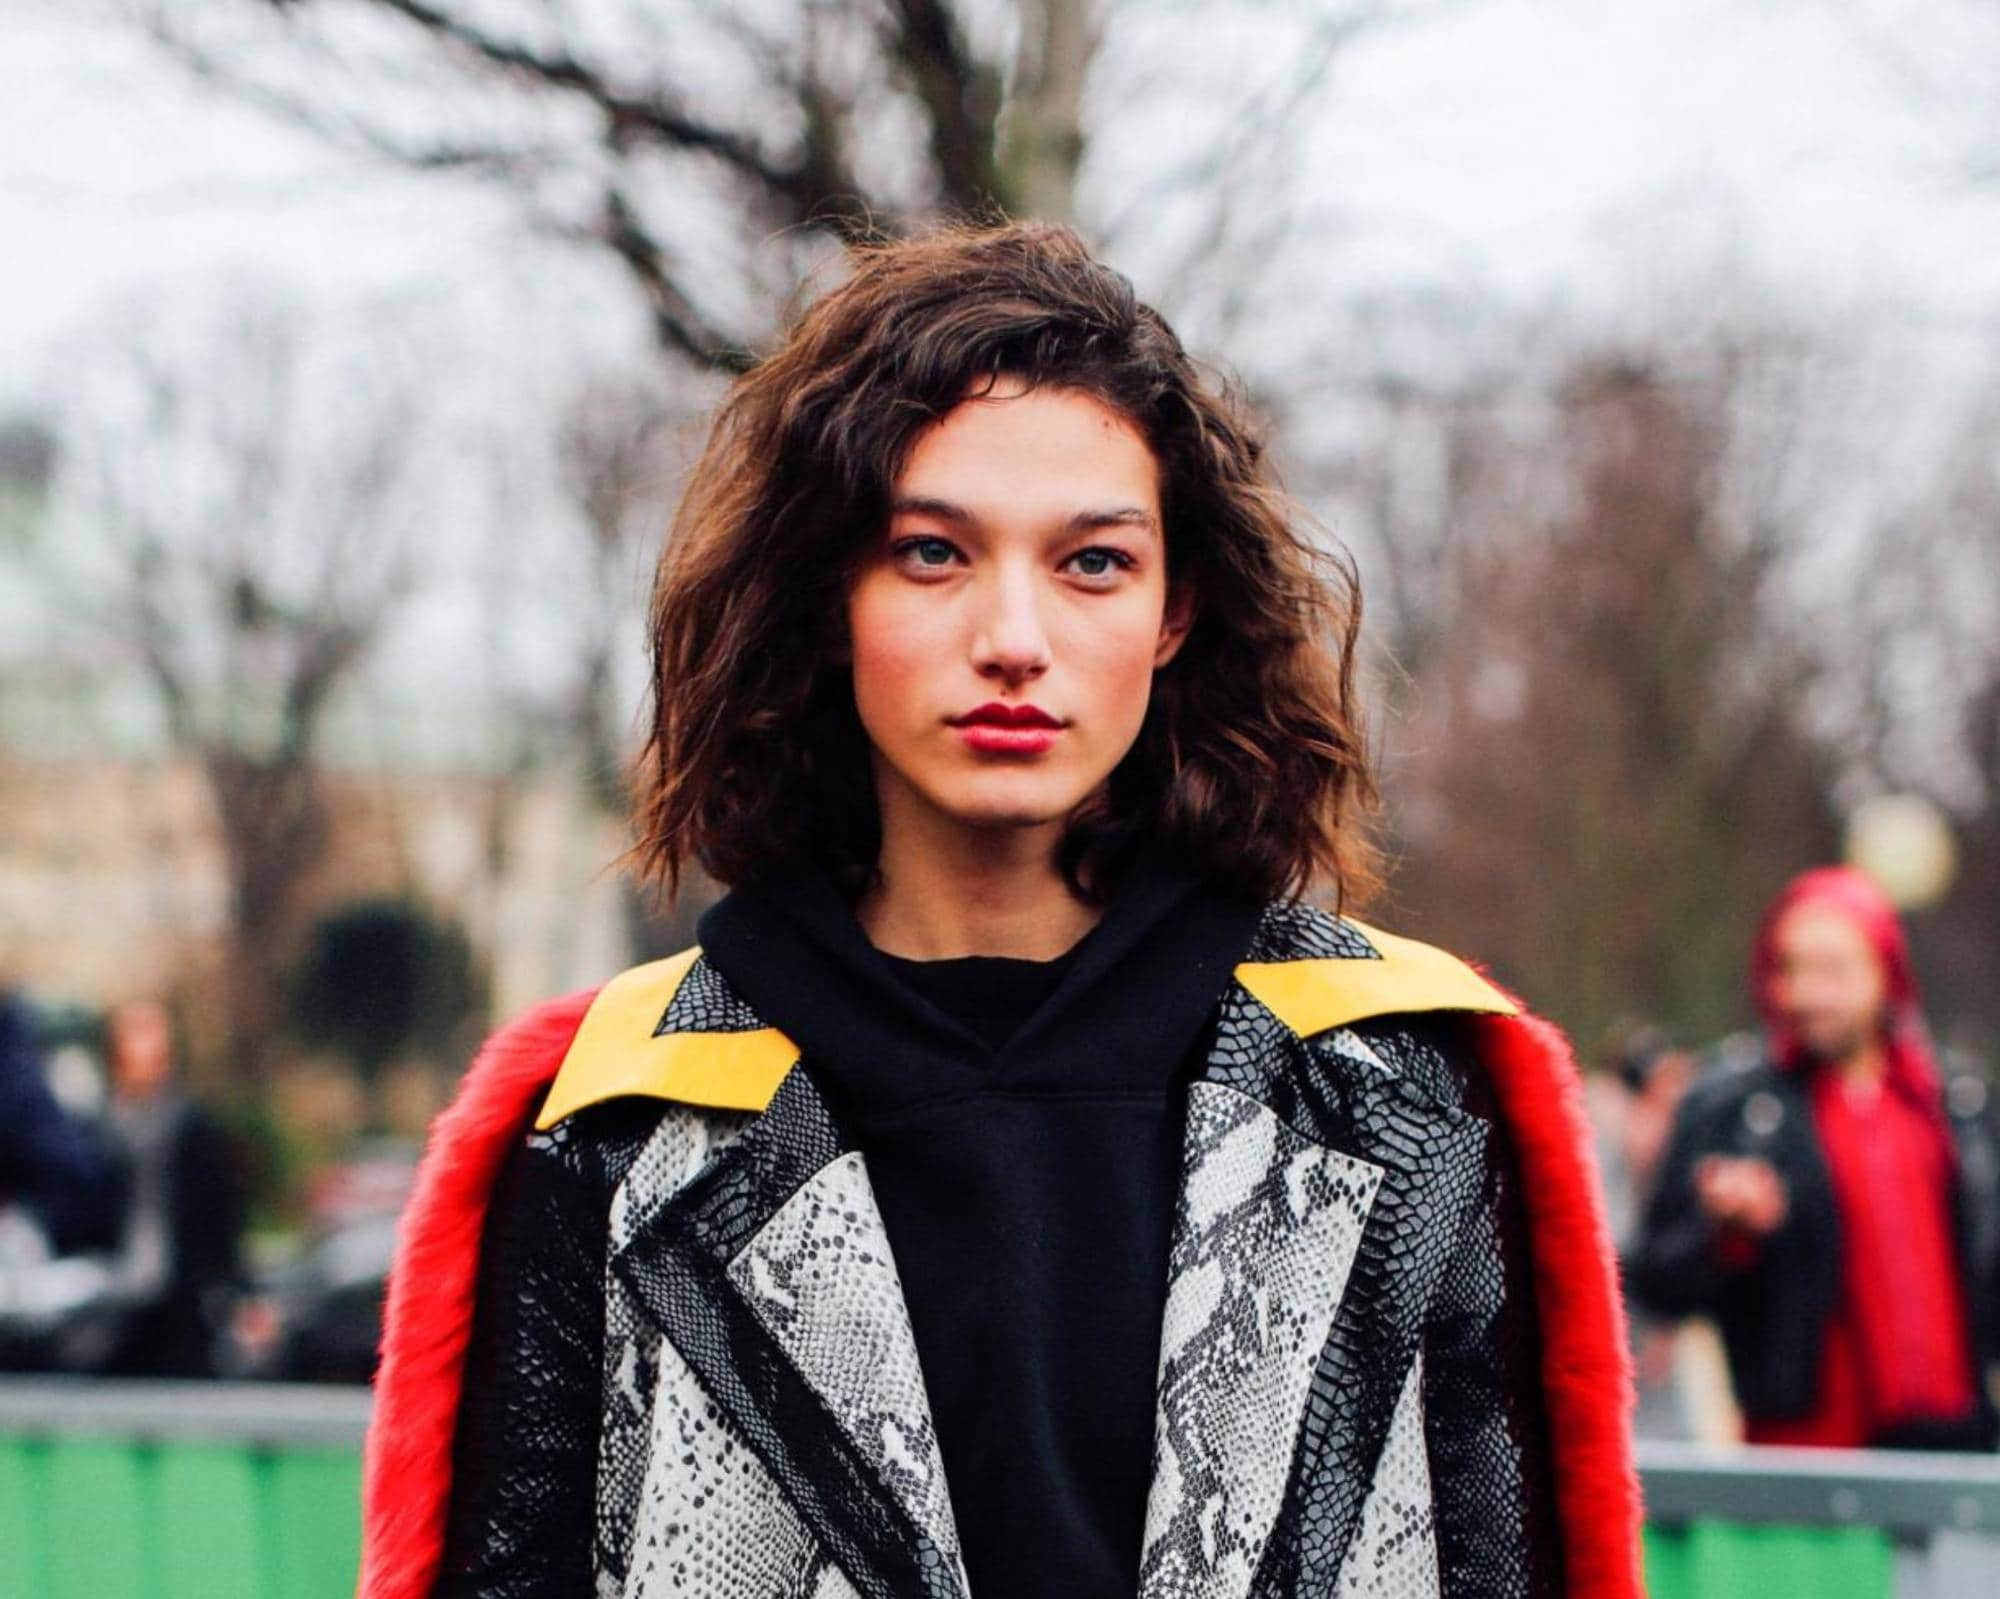 Mahogany Hair Color: Woman with short curly dark hair wearing a jacket outdoors